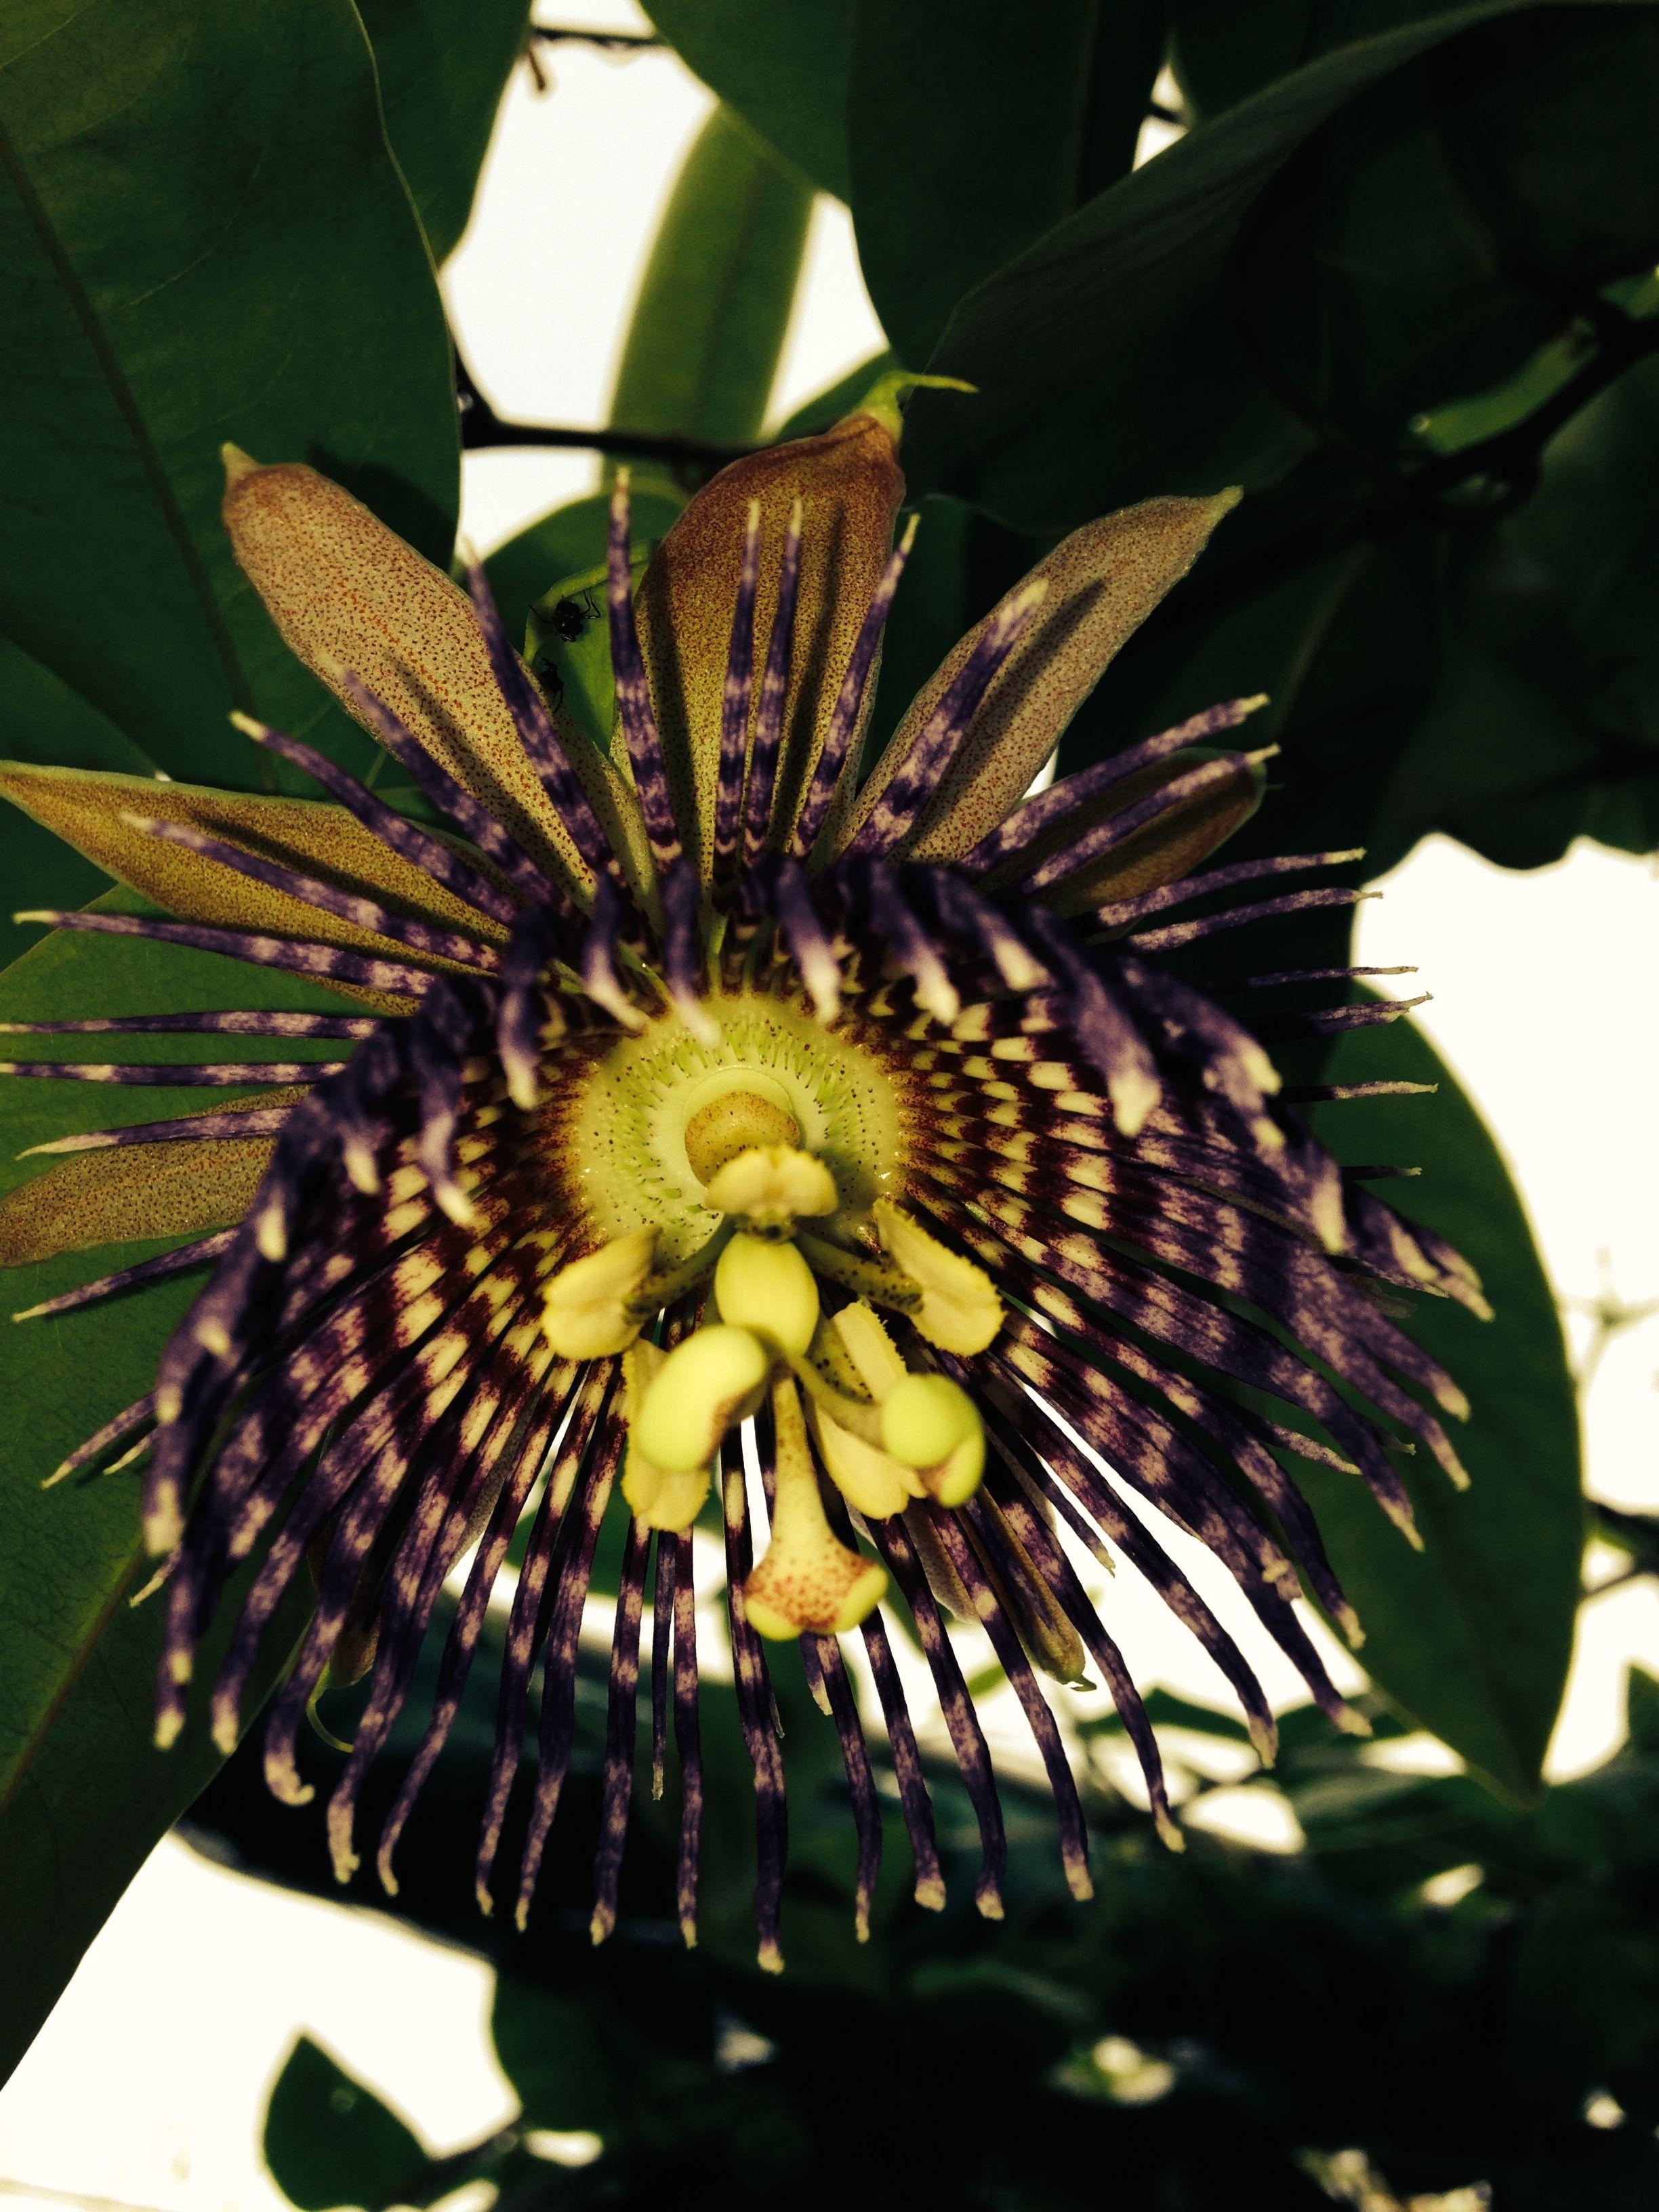 The passion fruit flower looks like something extra